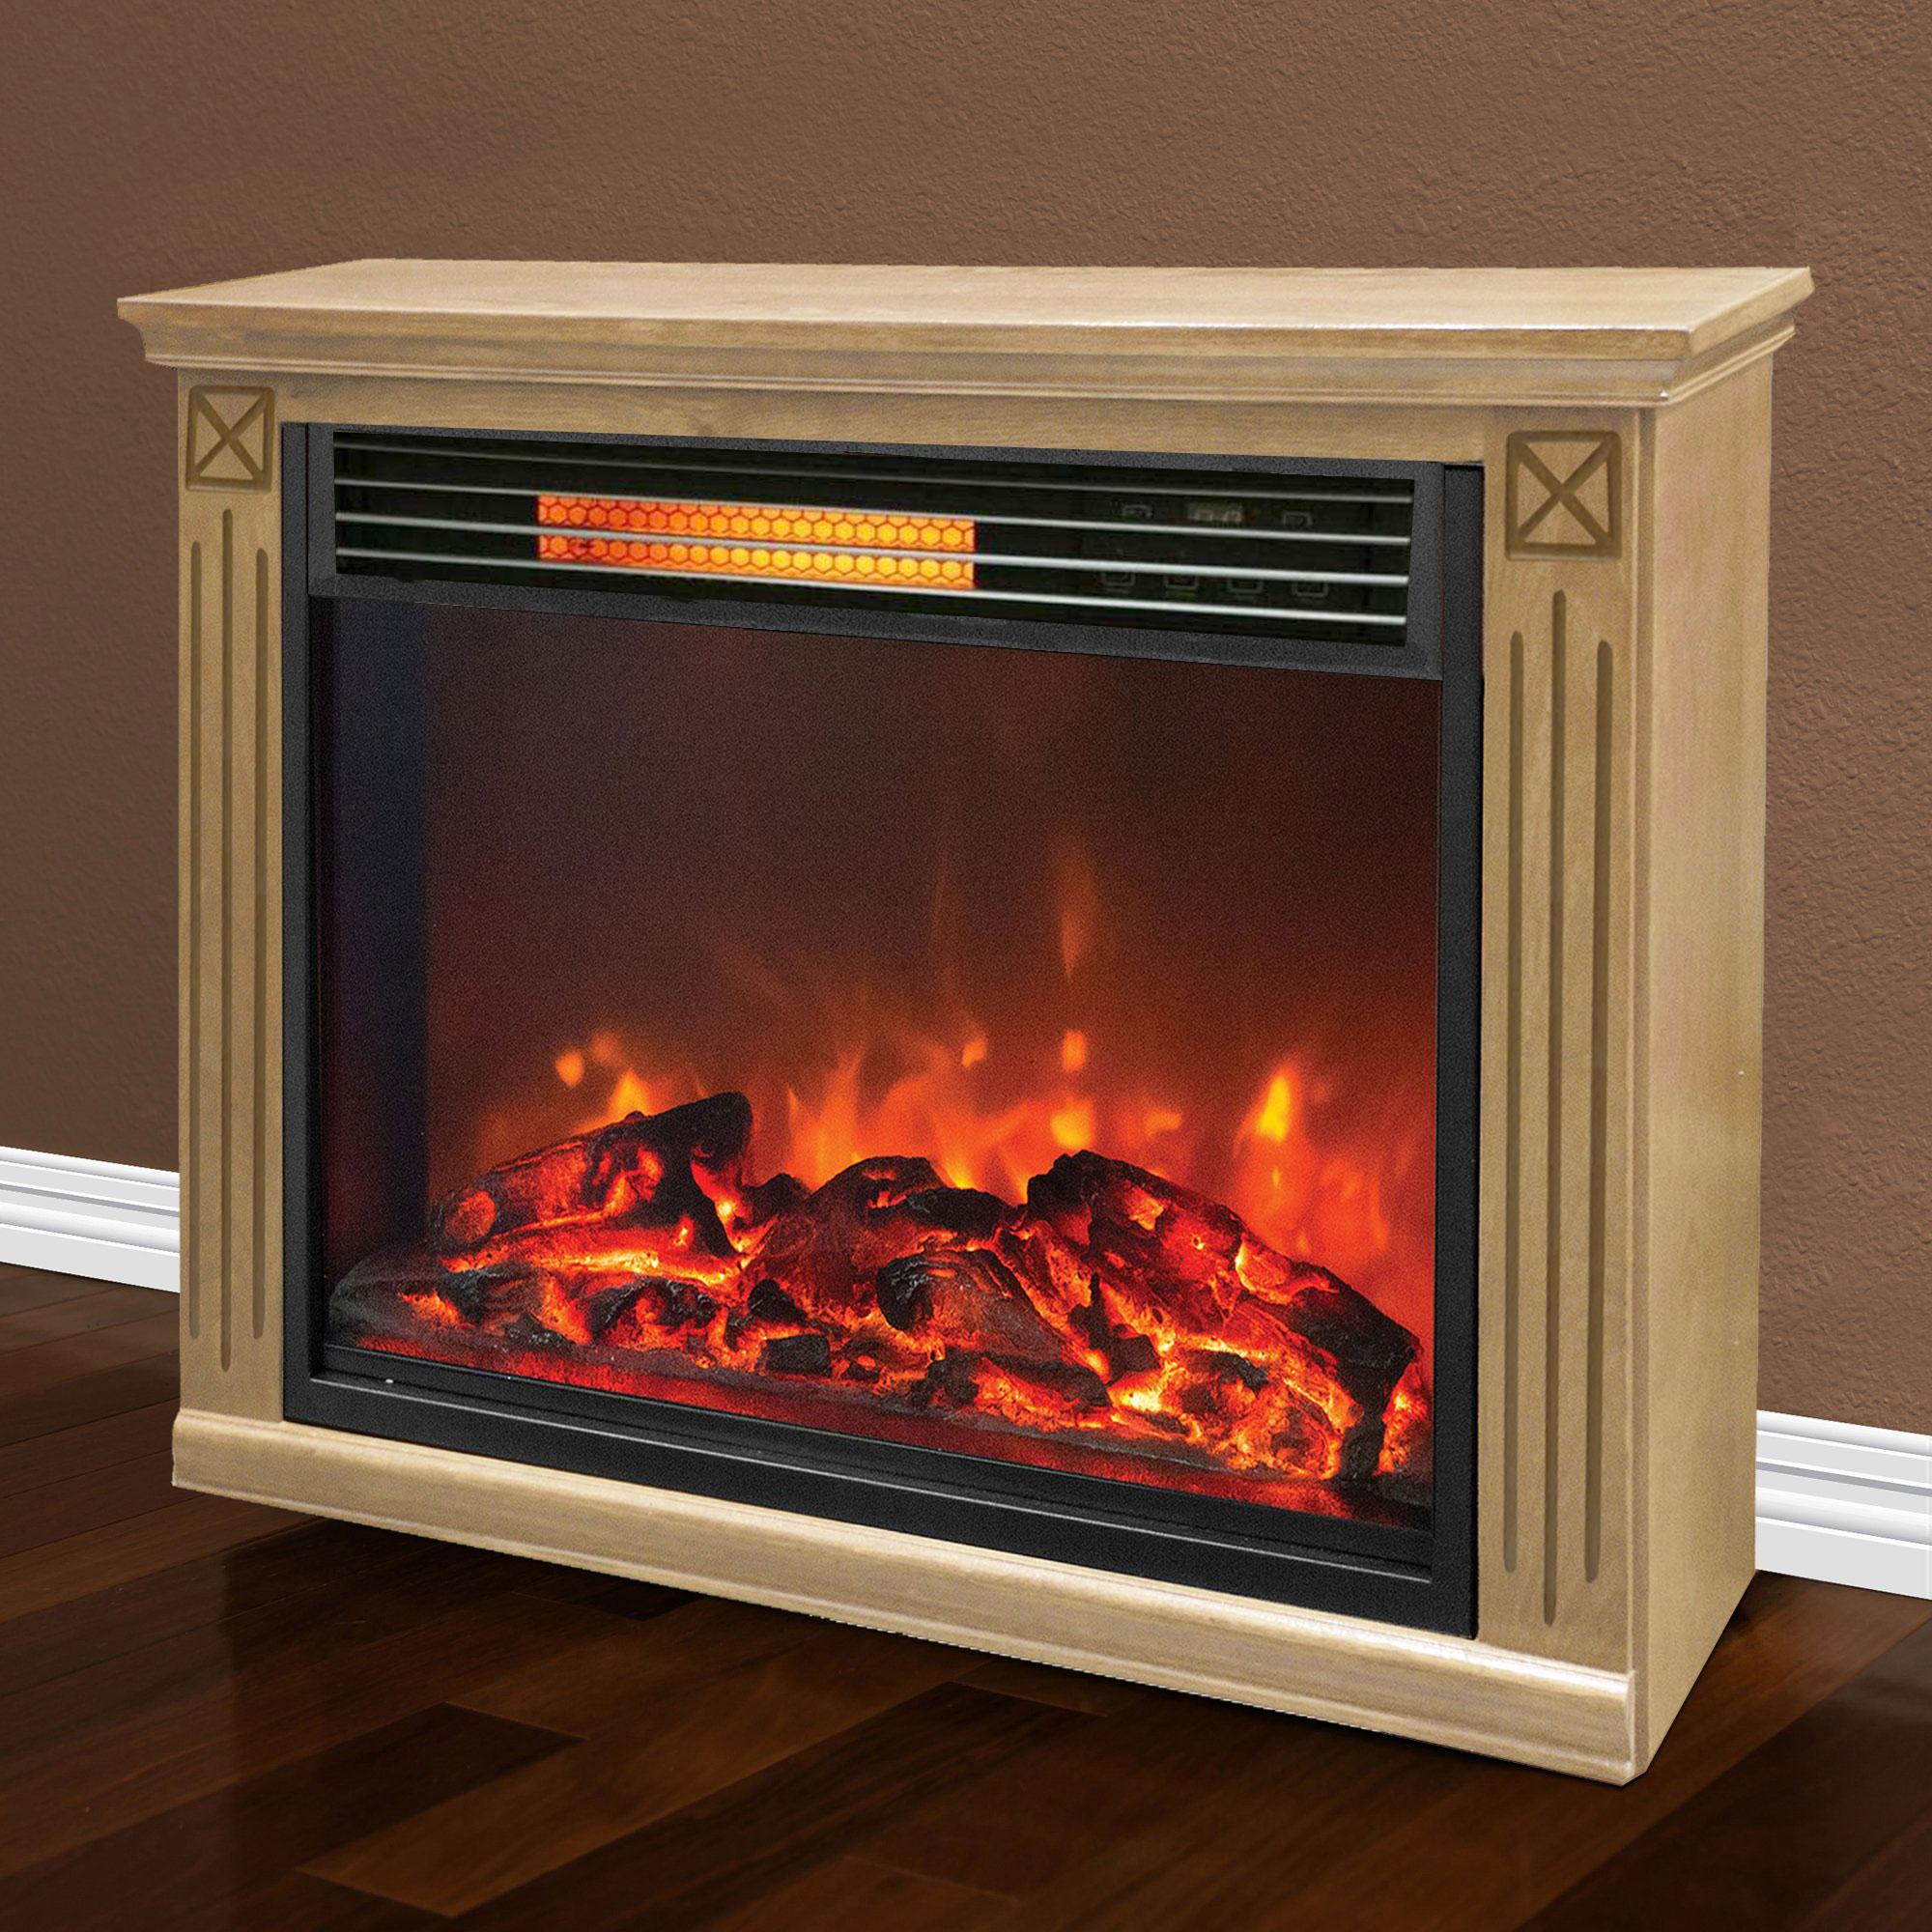 Lifesmart Big Room Electric Infrared Quartz Fireplace